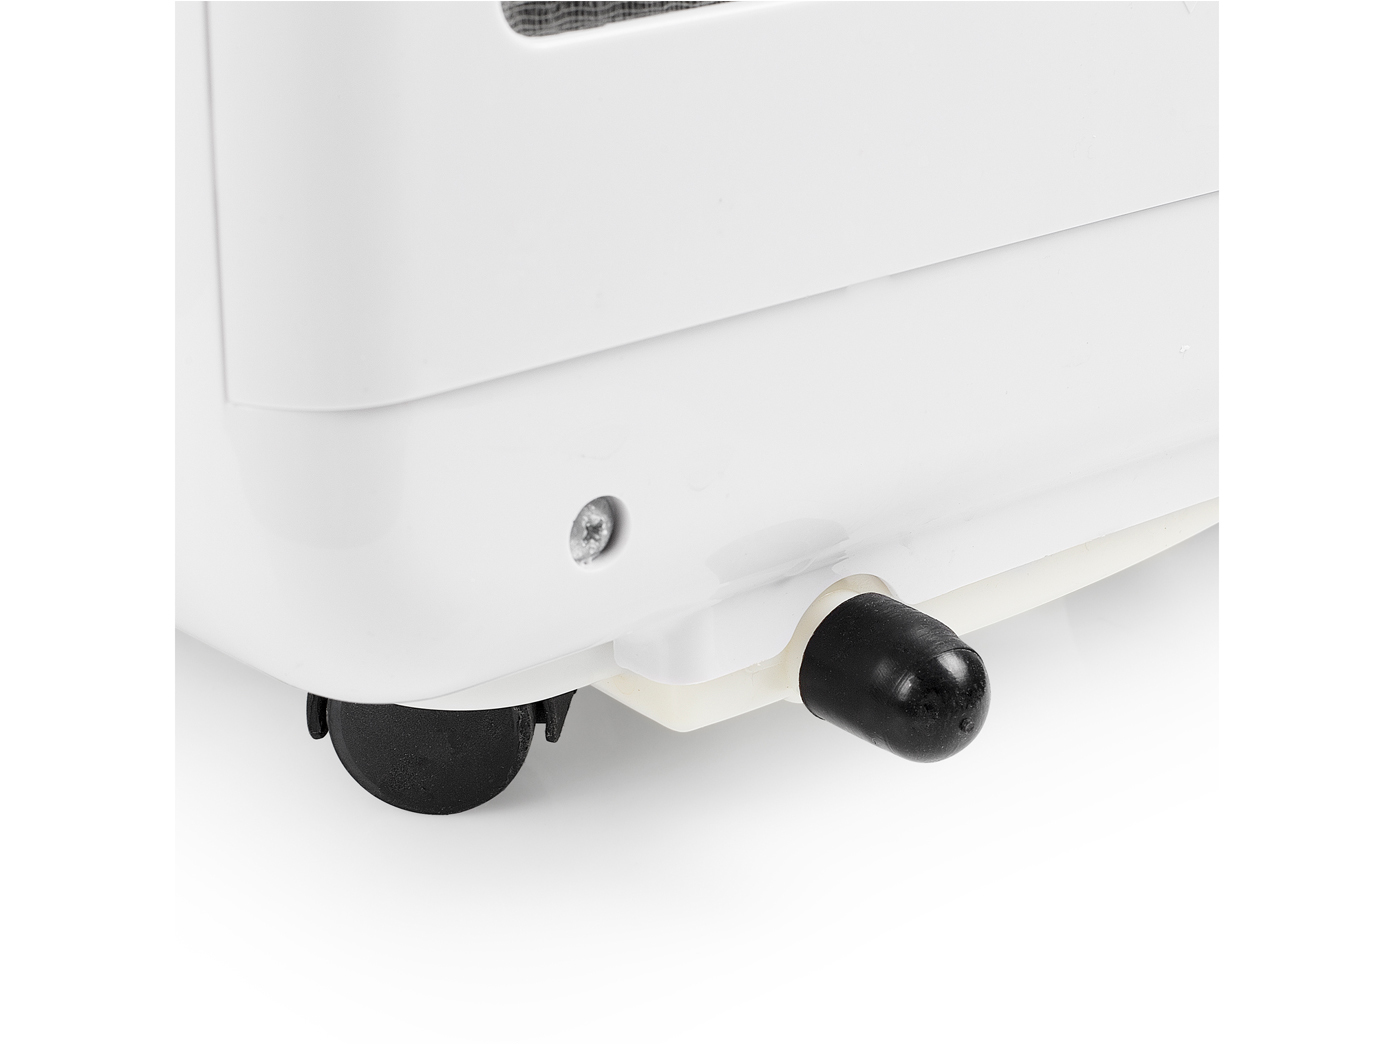 Lokales Klimagerät 4 Betriebsarten Eek A 3 5kw Mobile Klimaanlage